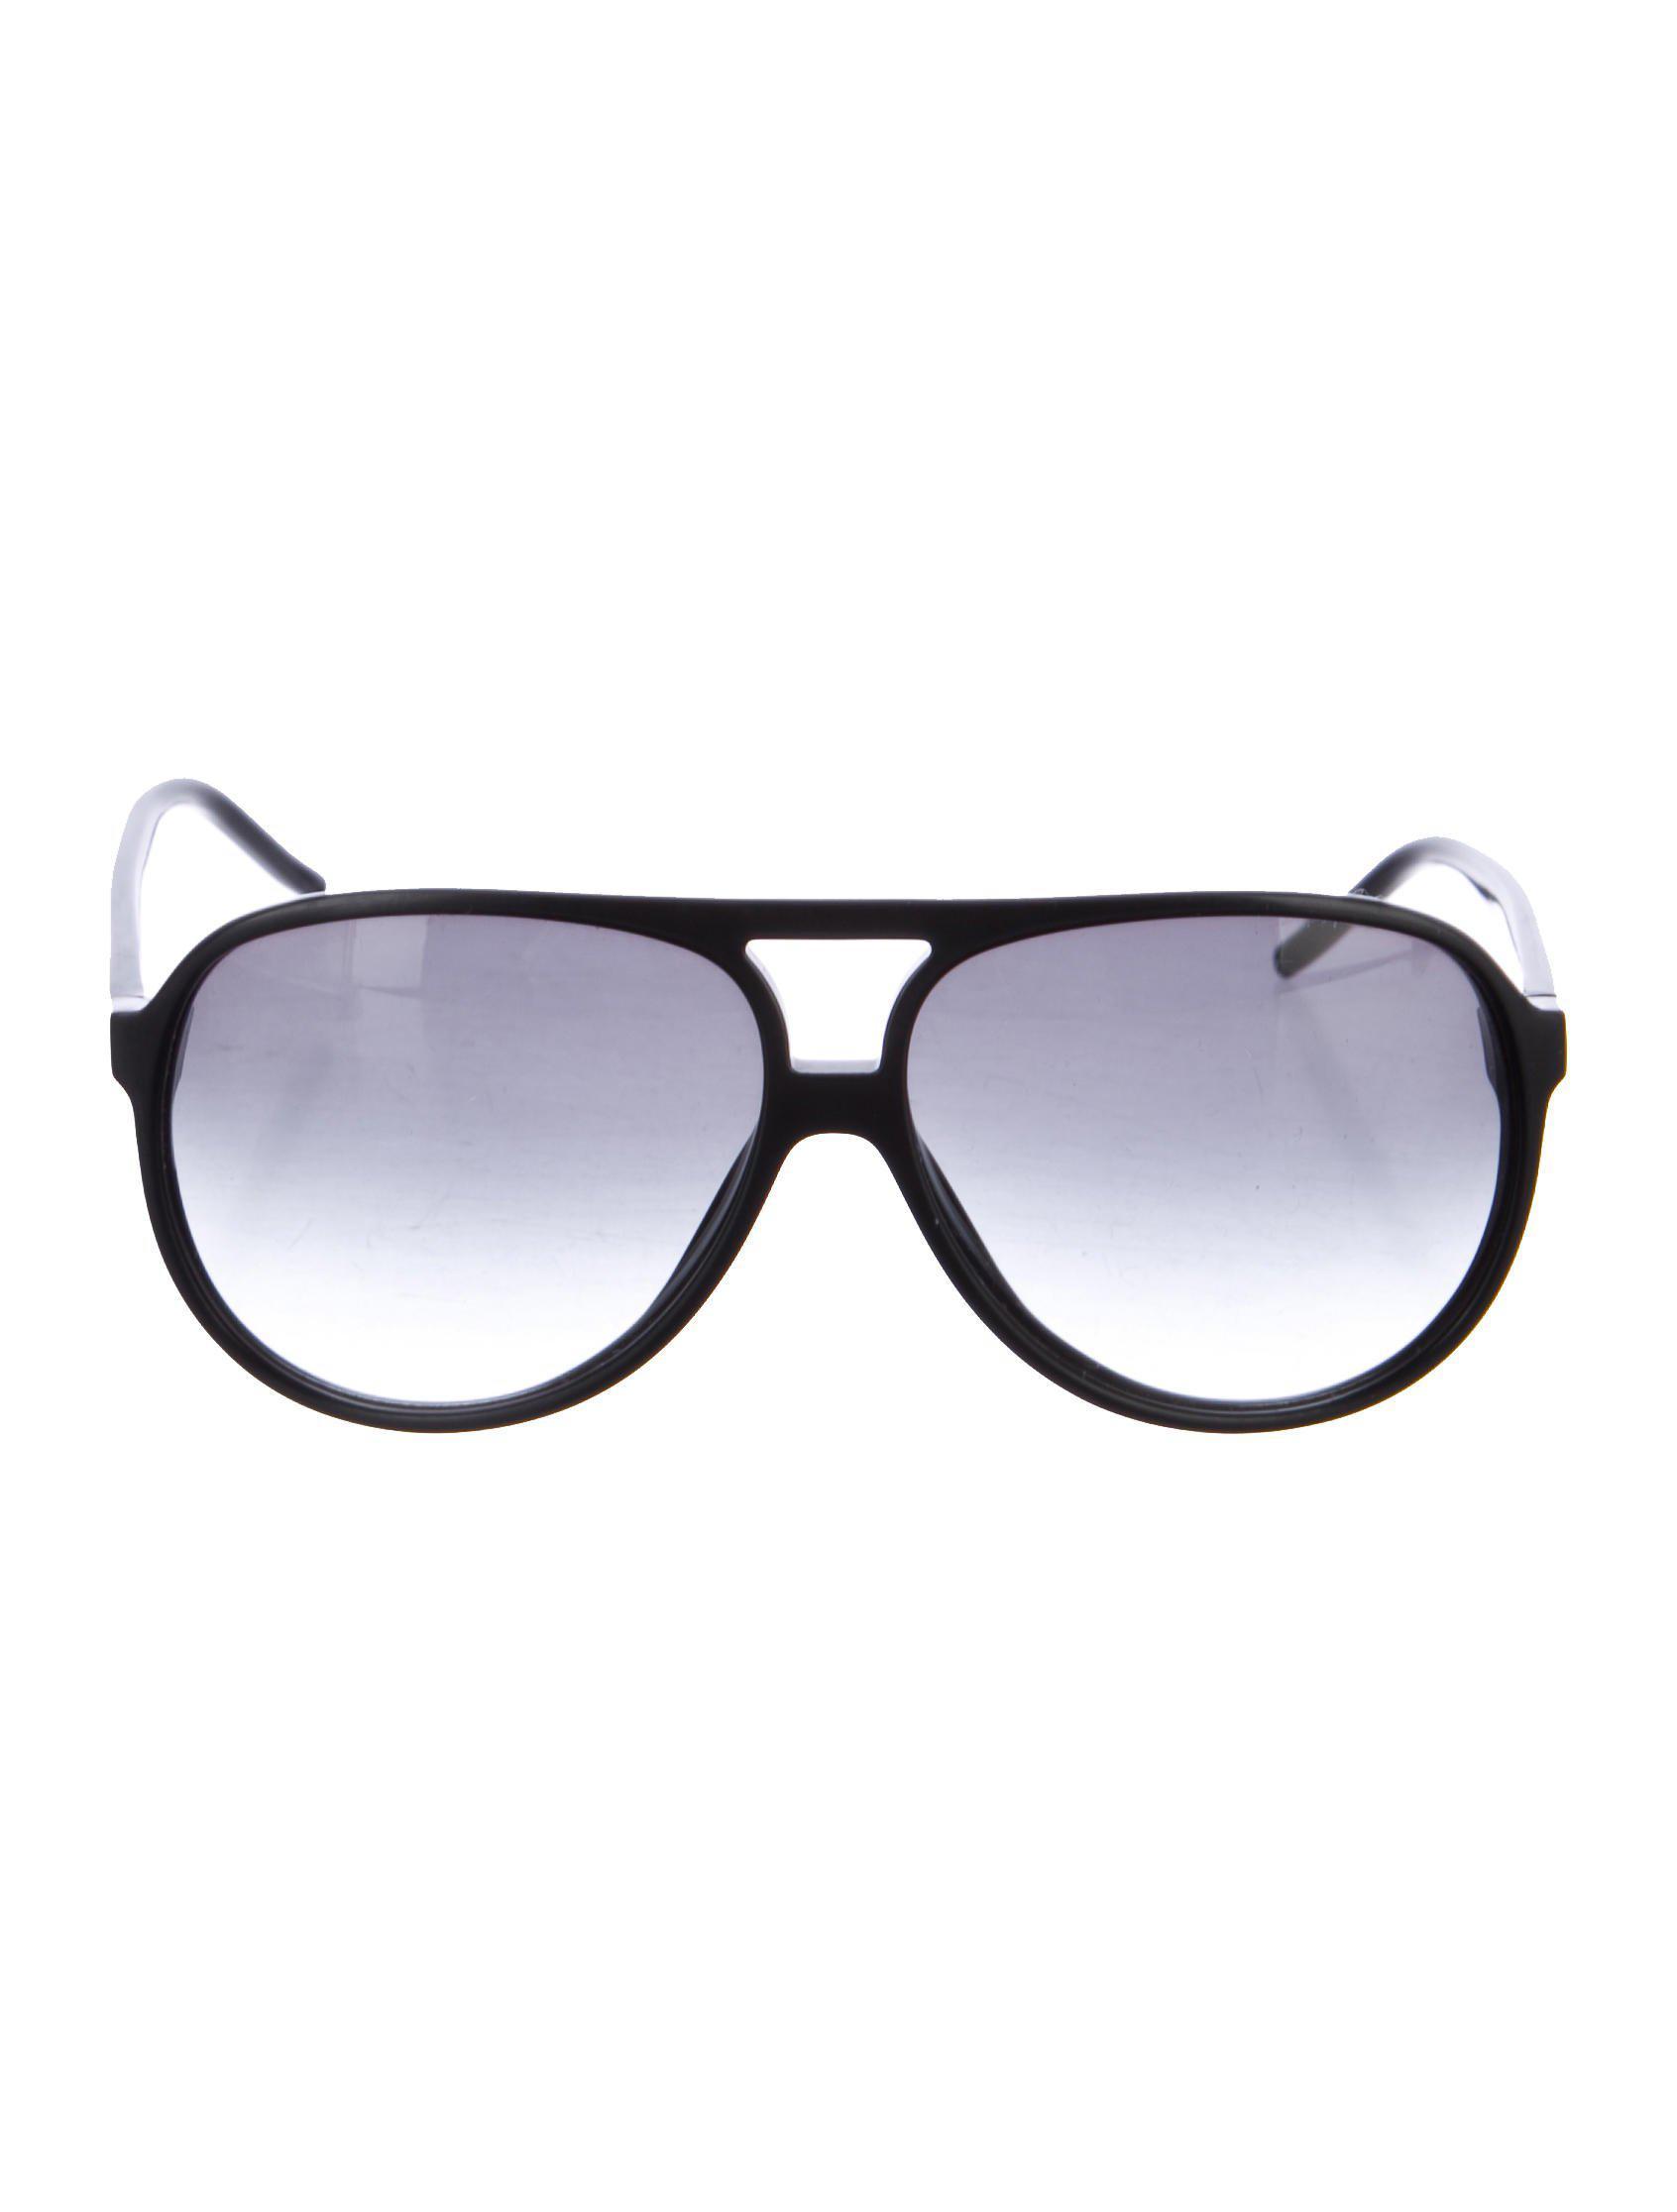 951cd5d6b8 Lyst - Dior Homme Gradient Aviator Sunglasses in Black